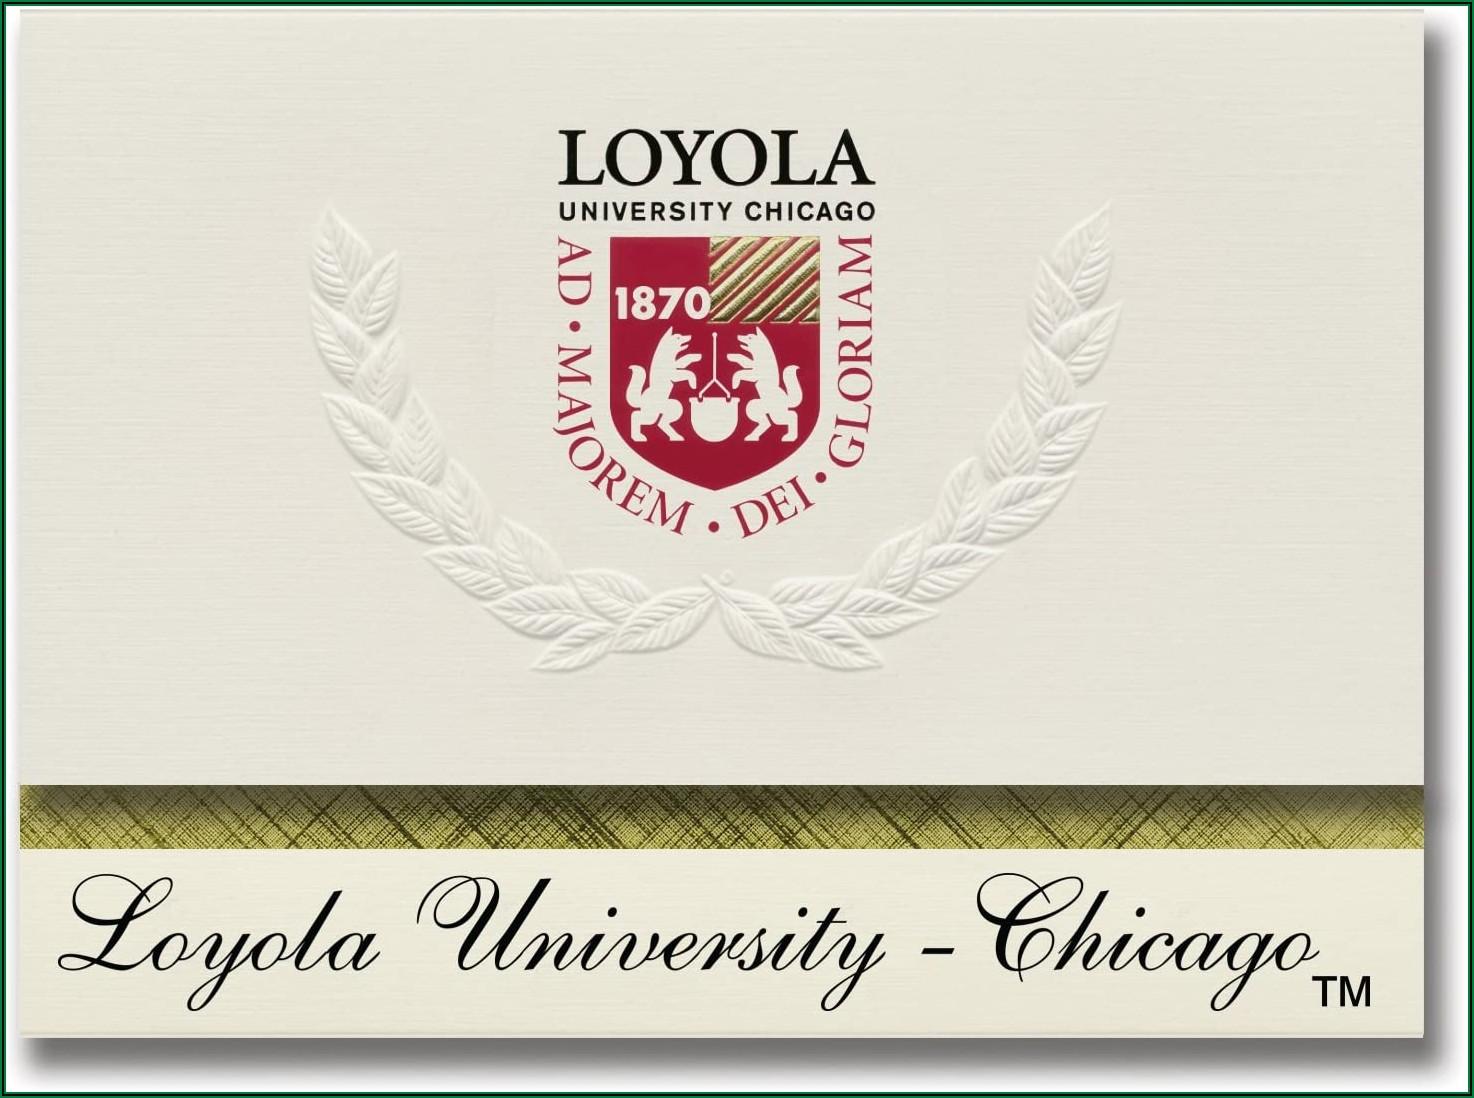 Loyola University Chicago Graduation Announcements